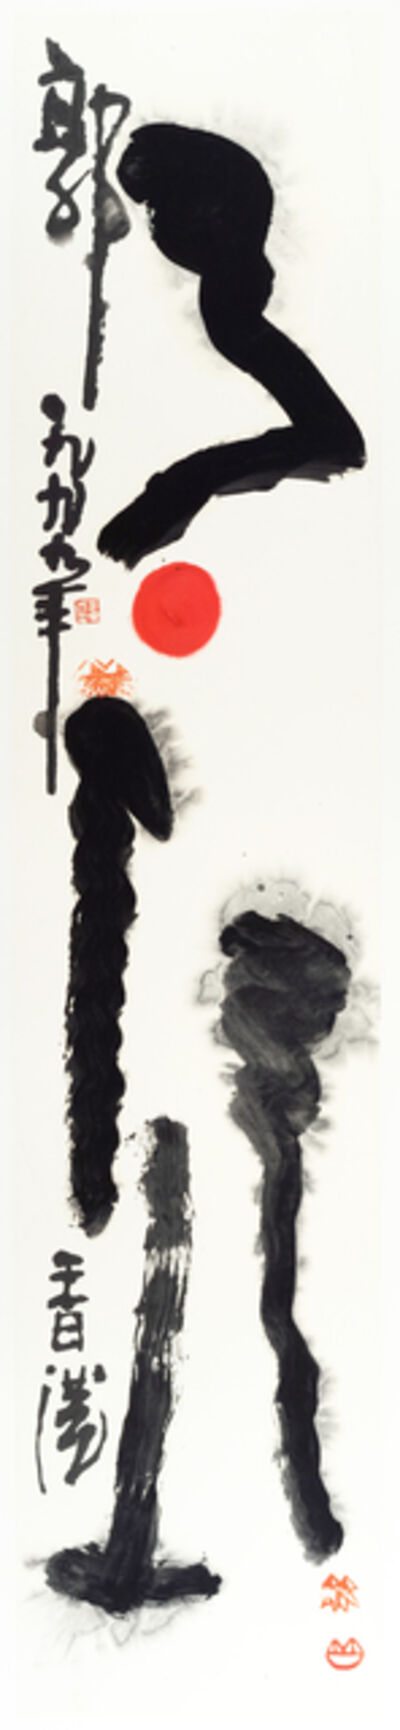 Frog King 蛙王, 'Renewal', 1999